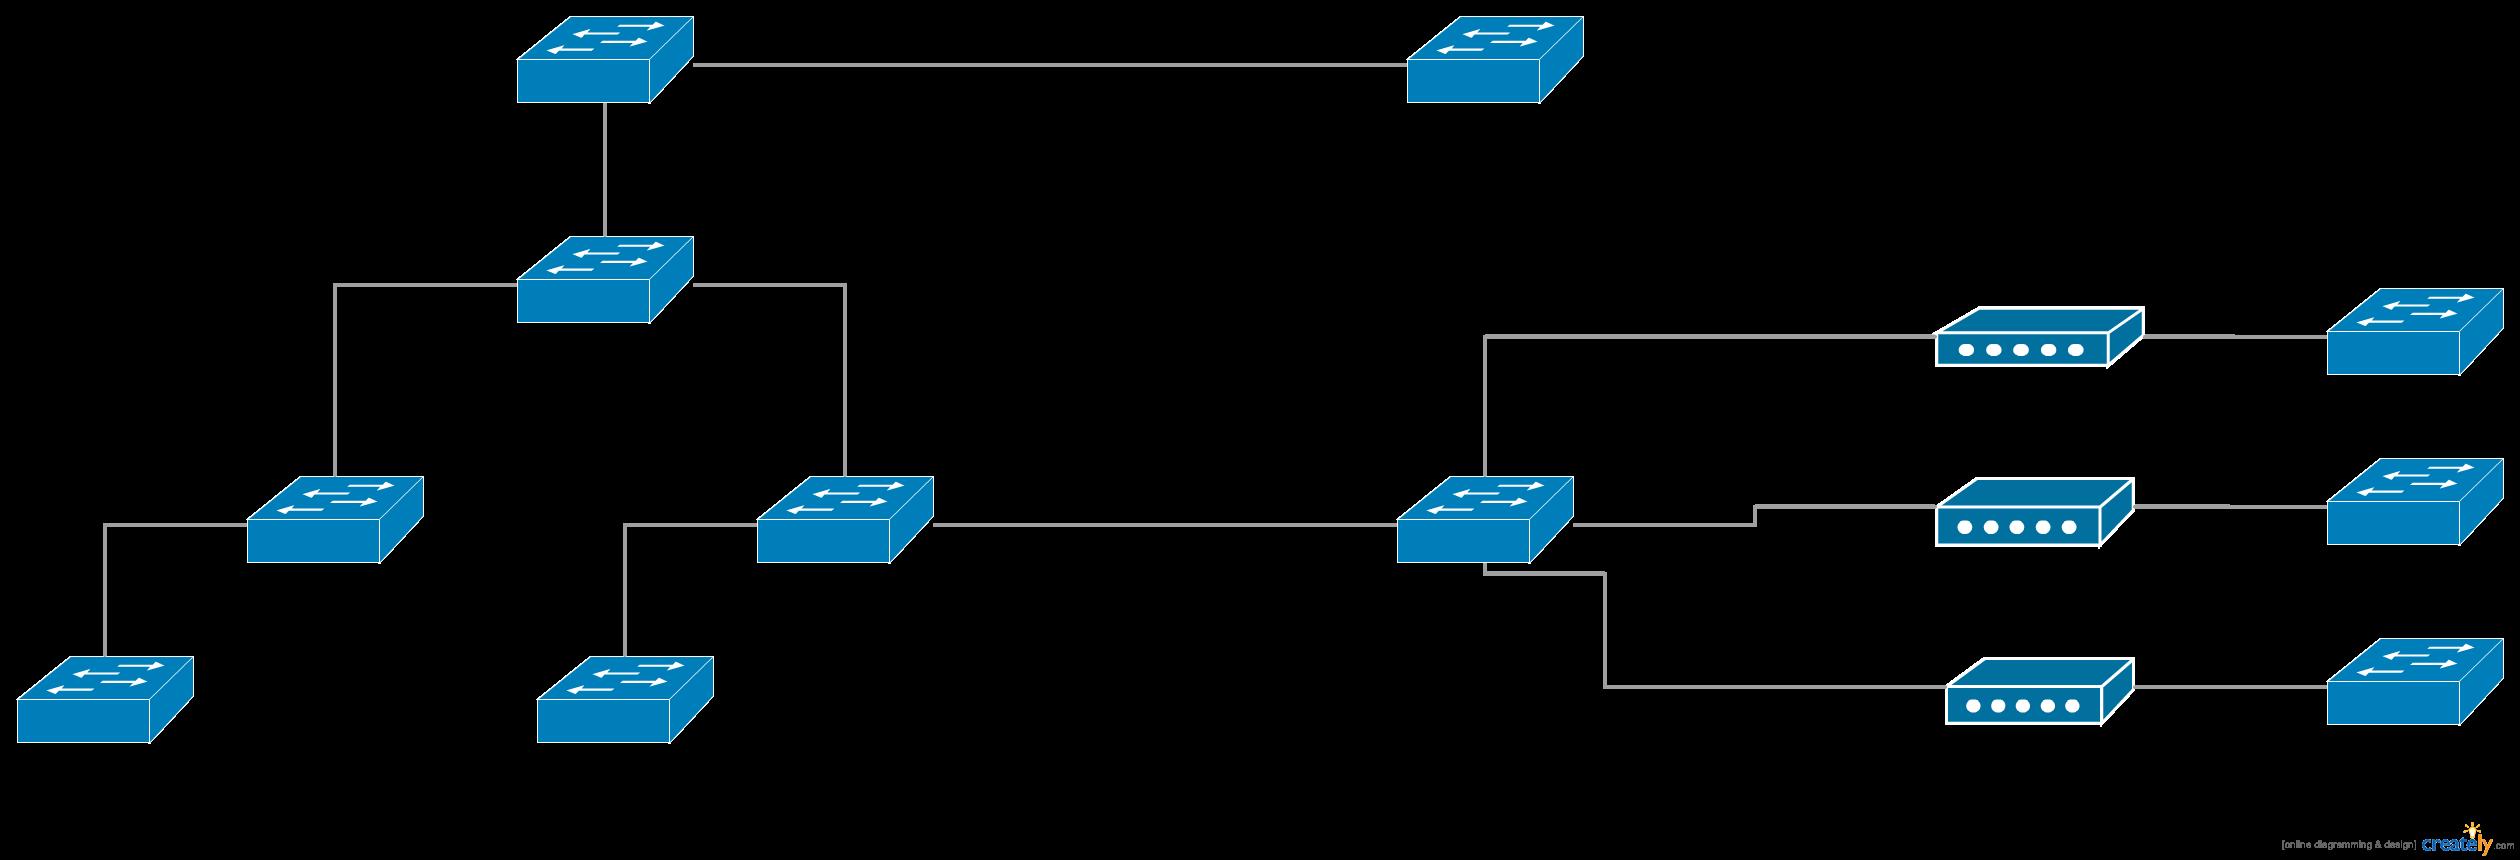 Inter-VLAN routing configurations (Cisco Catalyst 2960)